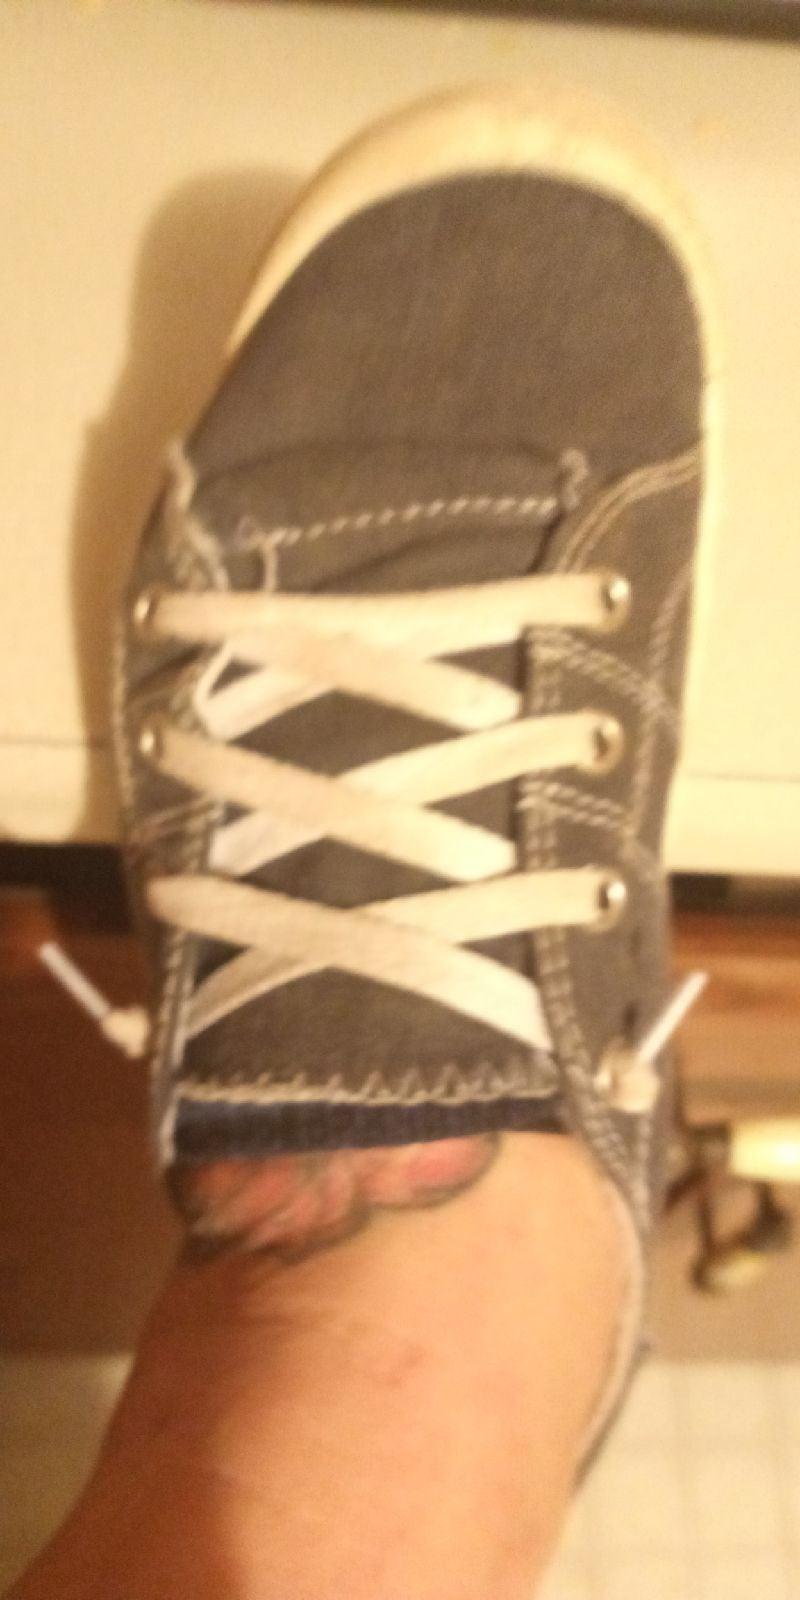 shoes size 6 5 women